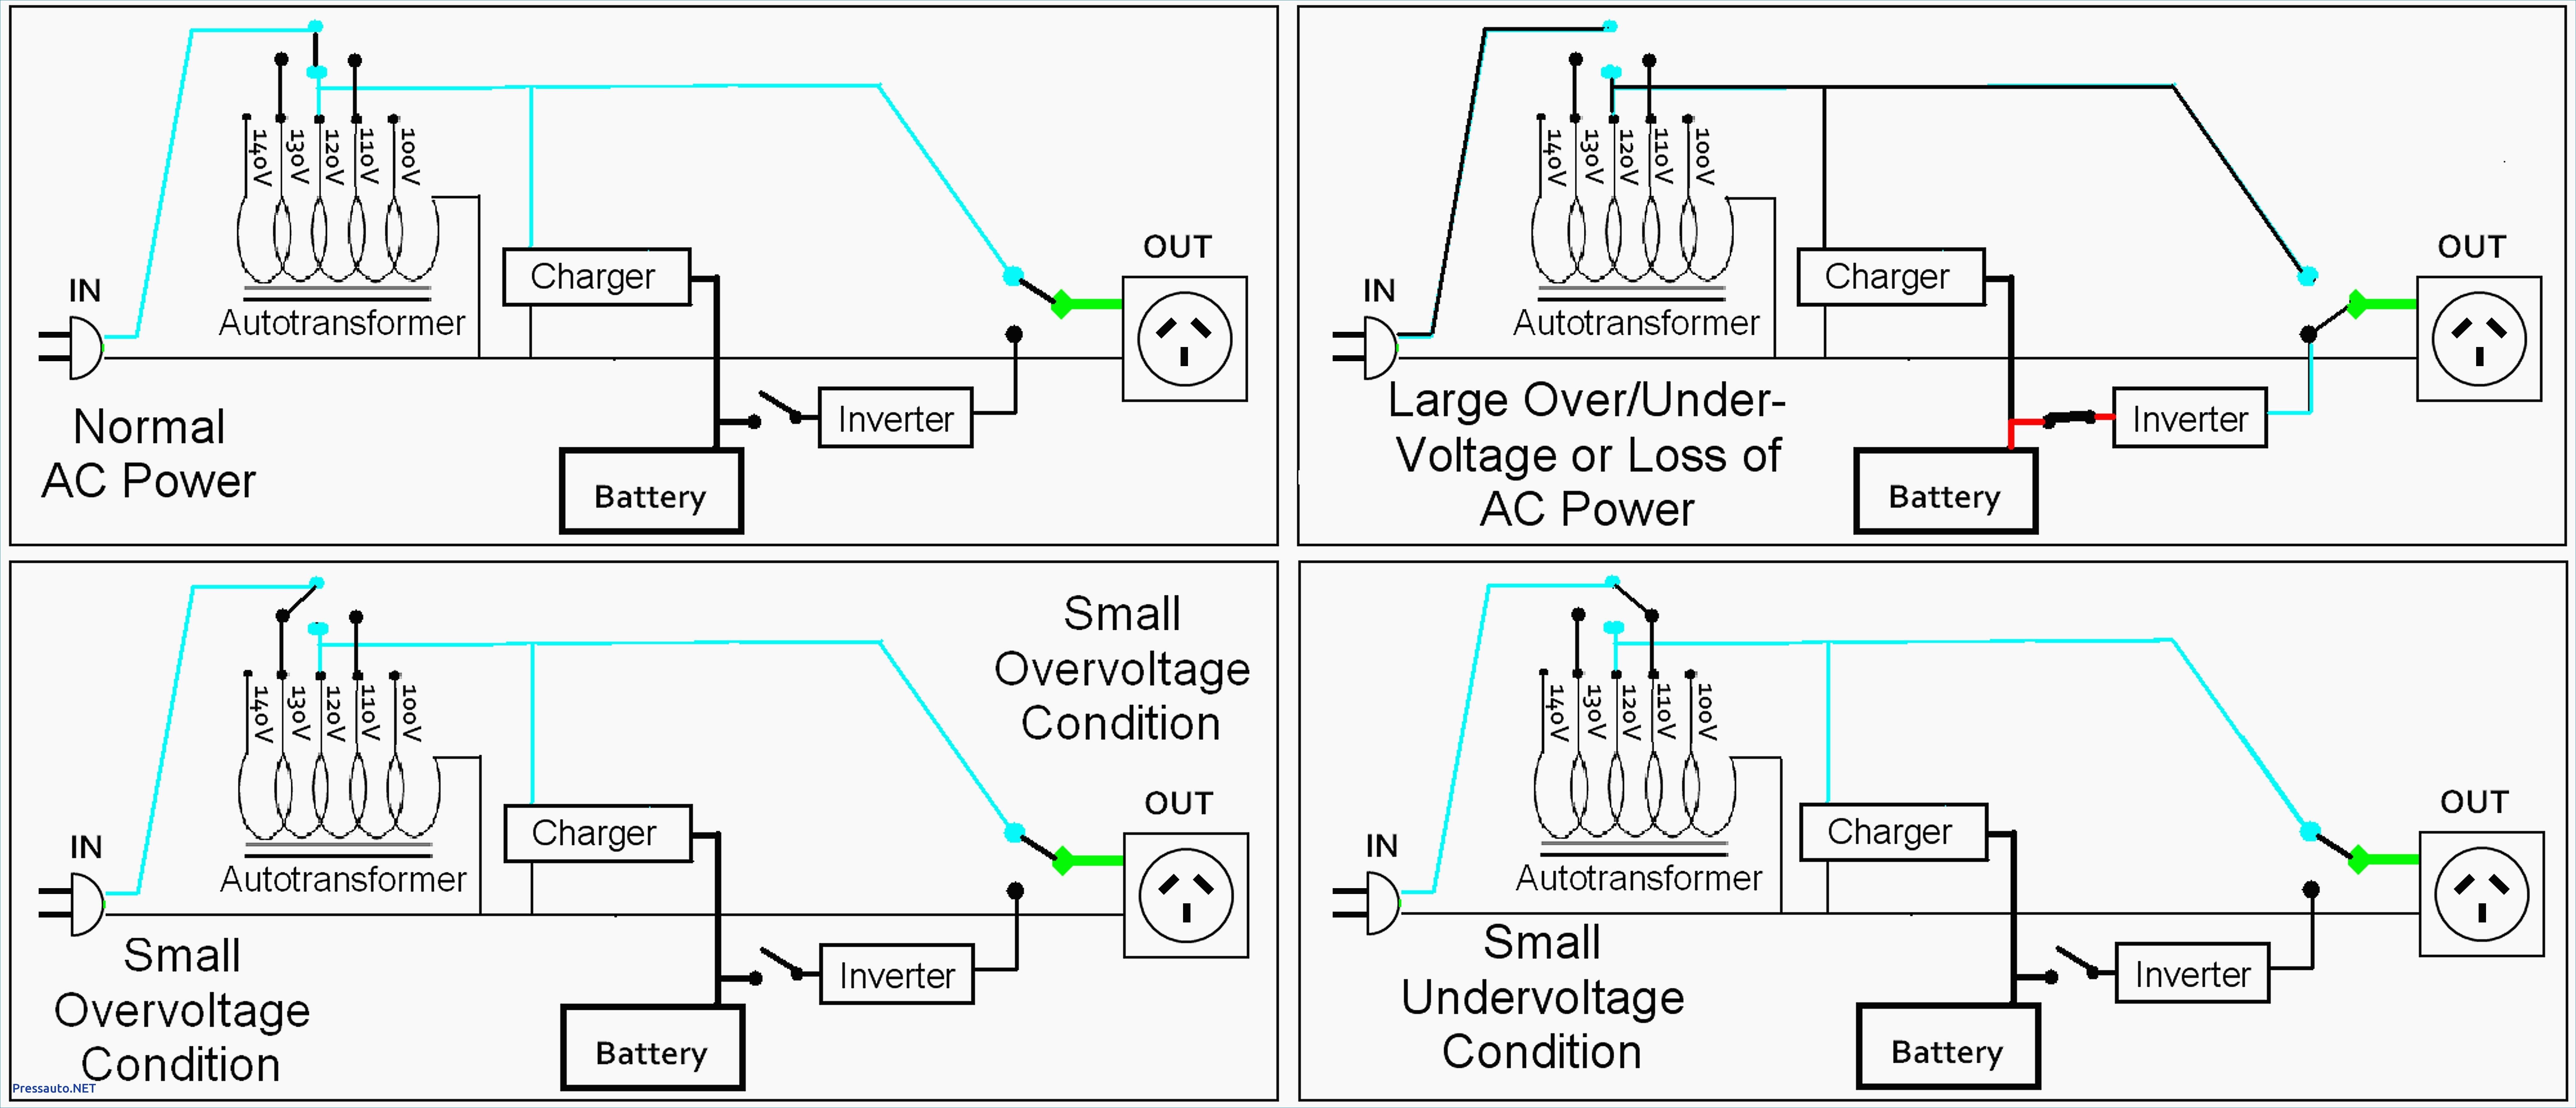 hevi duty transformer wiring diagram Collection-Ac Transformer Wiring Diagram New Hevi Duty Transformer Wiring Diagram Collection 2-c